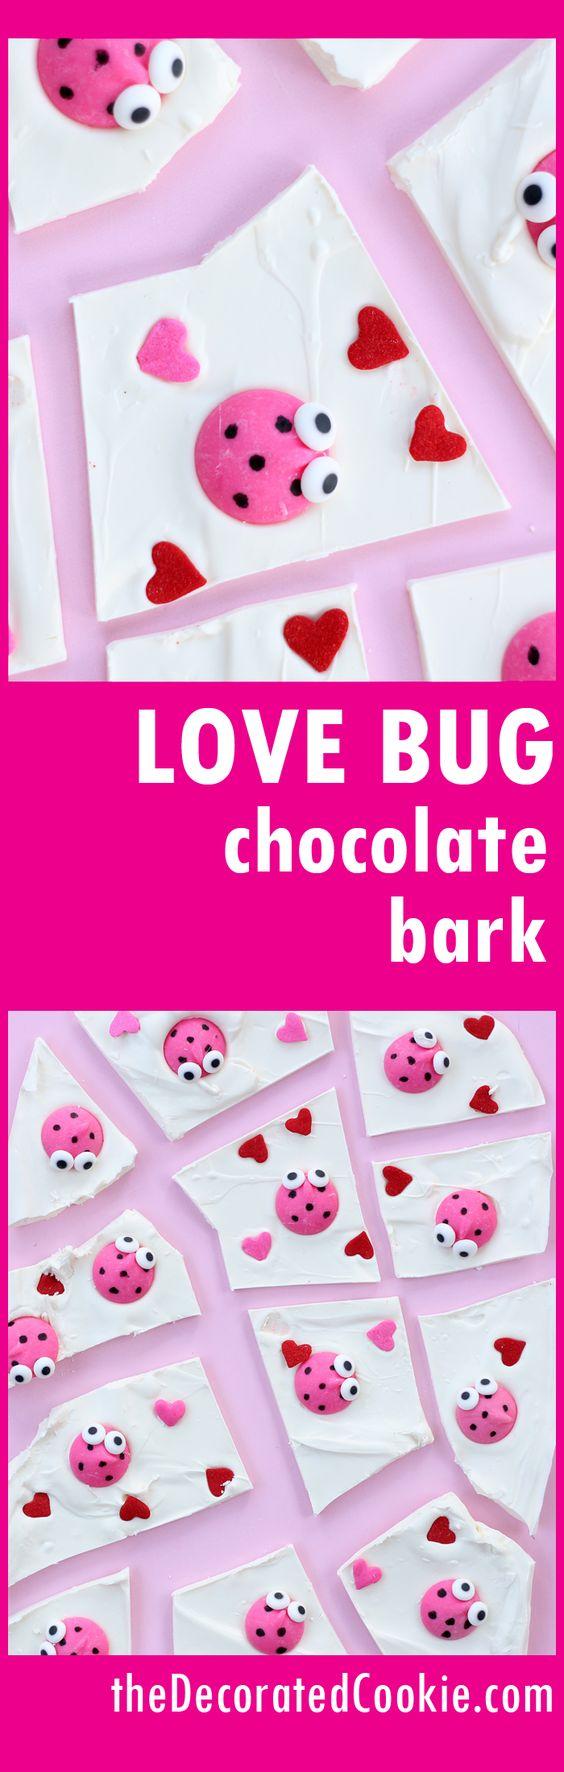 love bug chocolate bark for an easy Valentine's Day treat